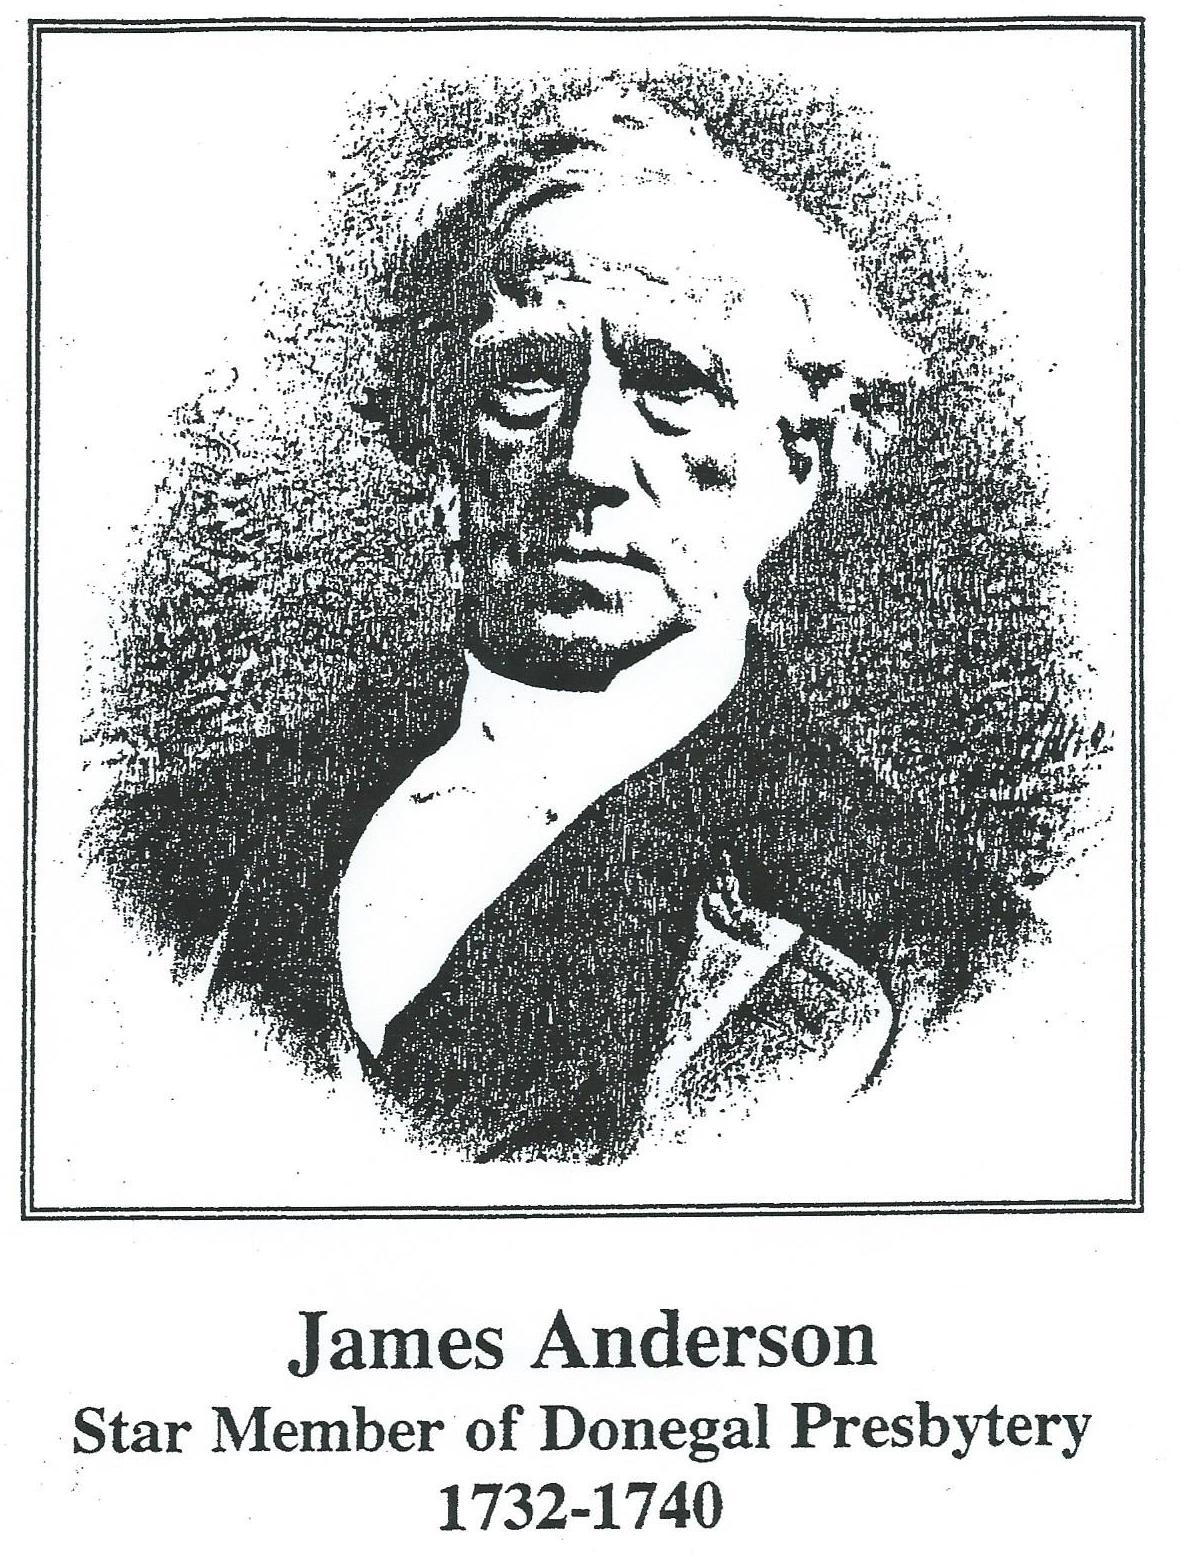 Anderson, James photo.jpg